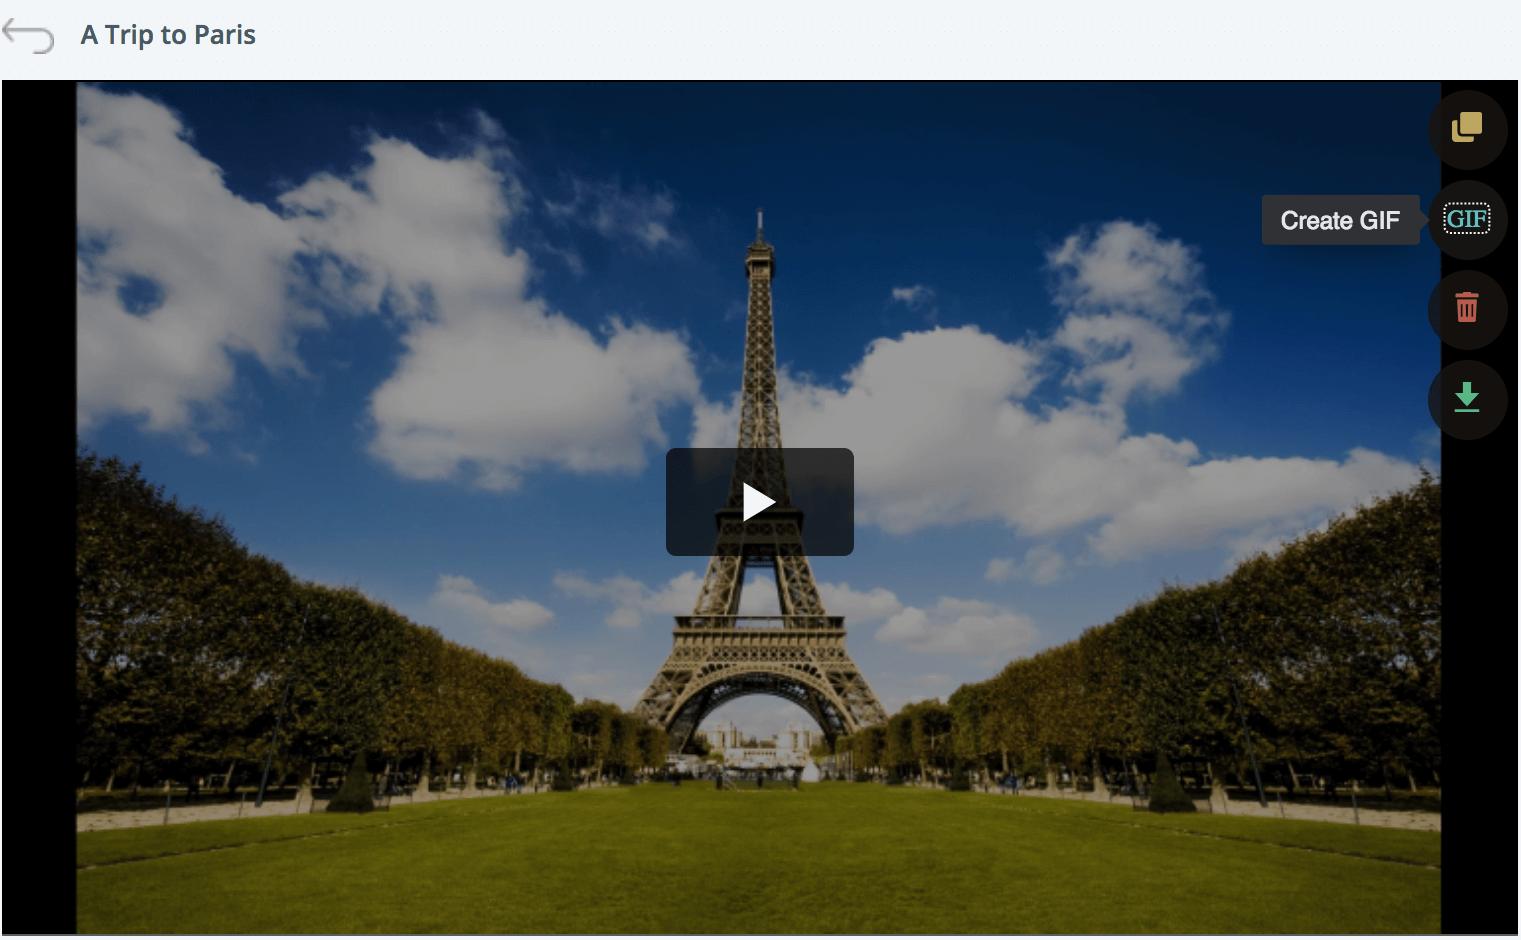 Convert videos to GIFs